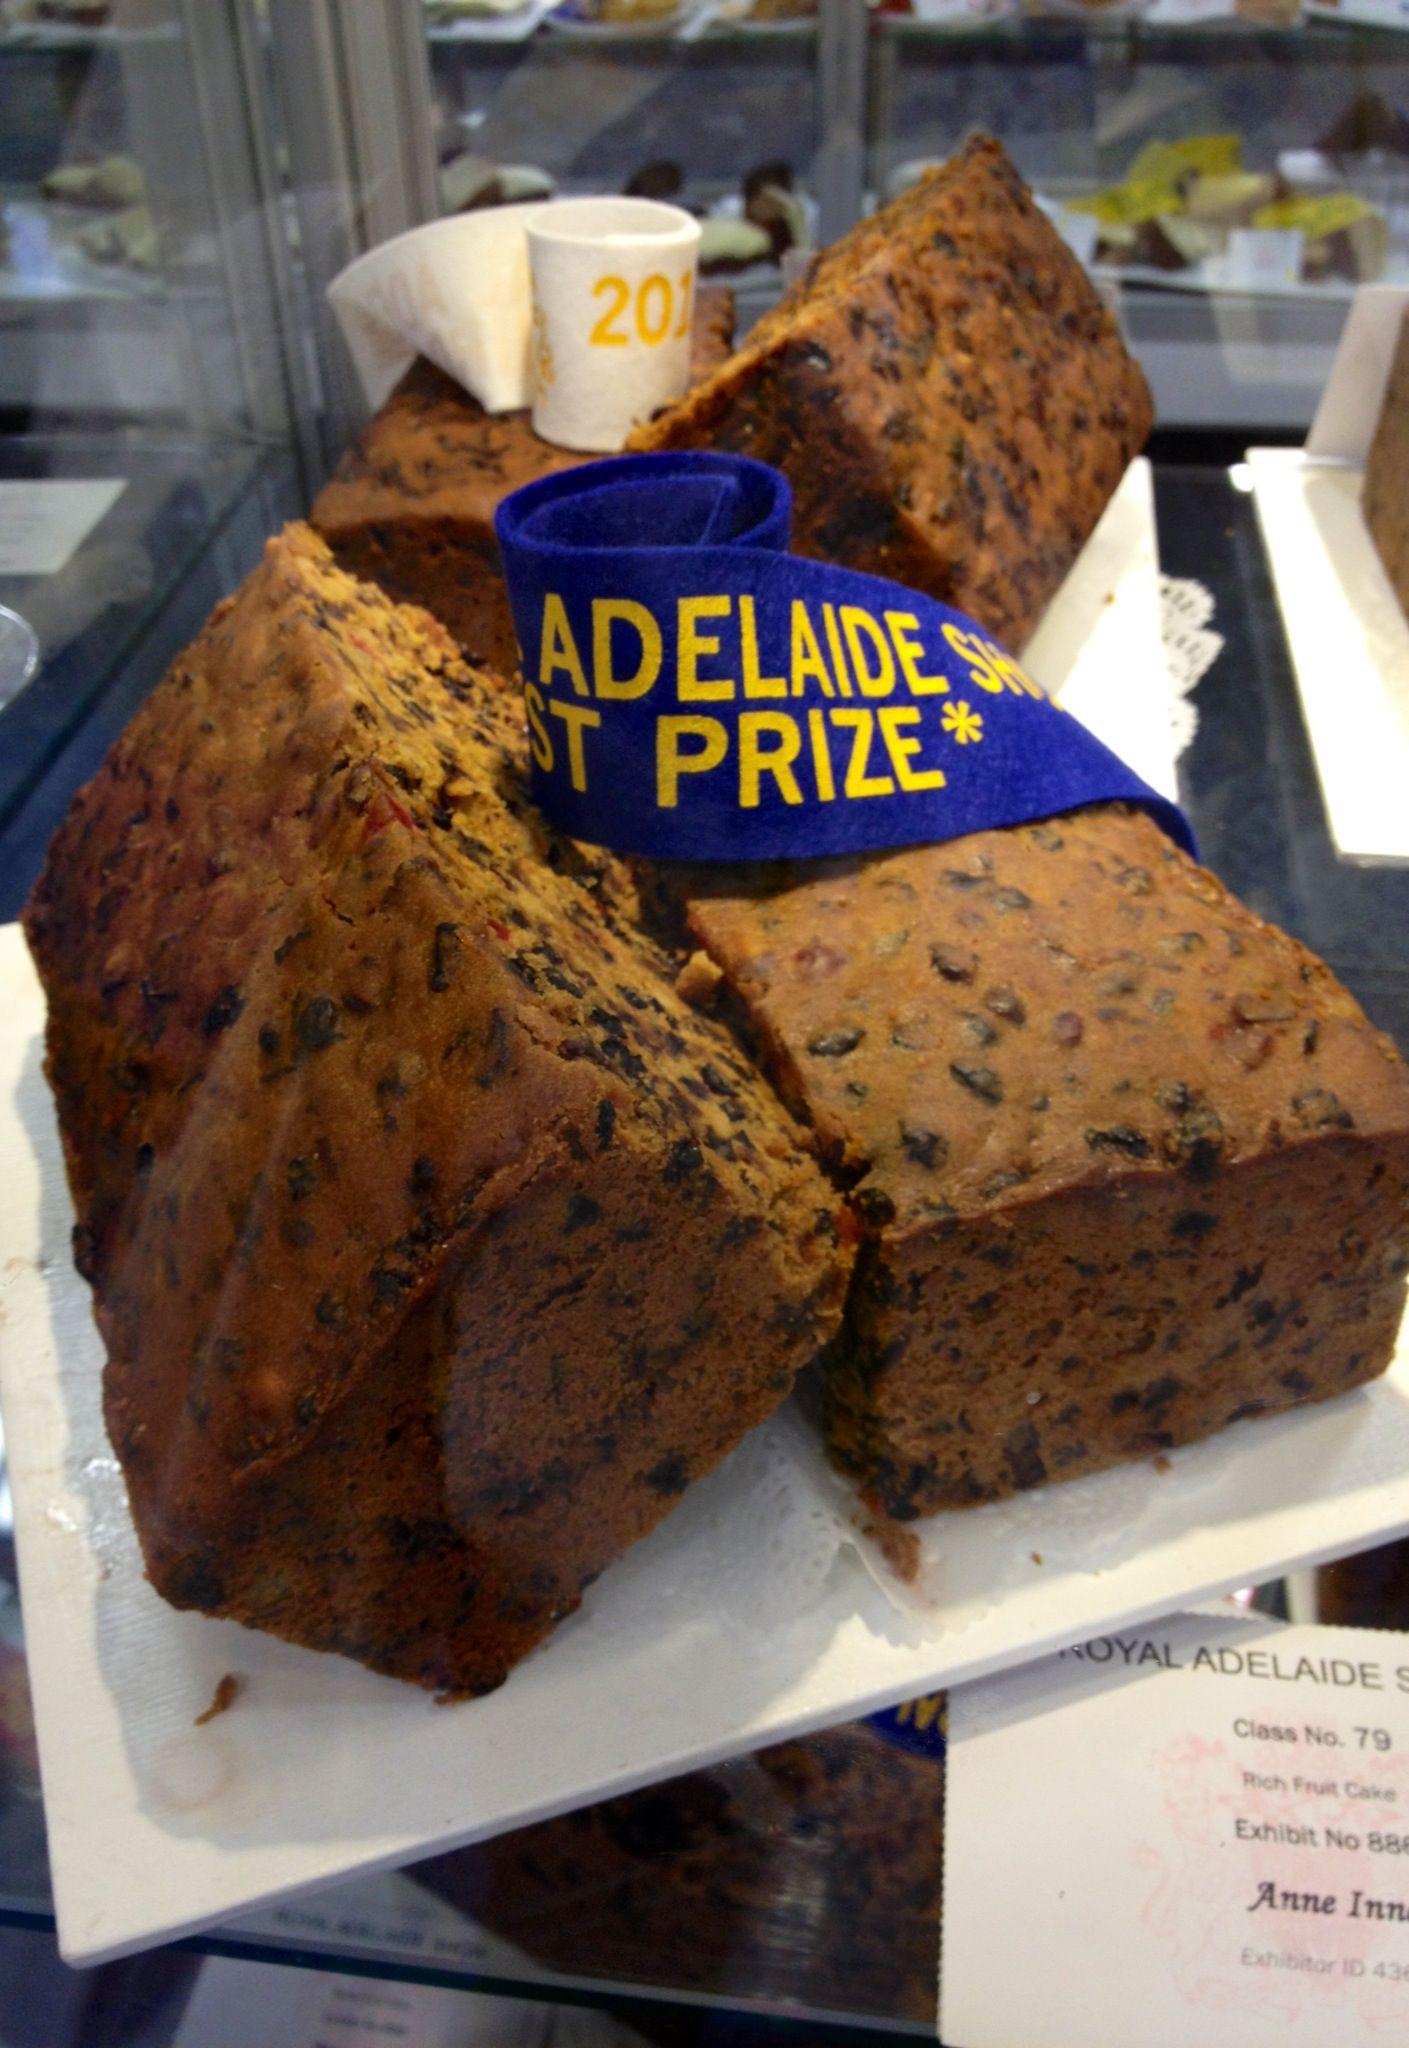 First prize winning rich dark fruit cake • The Royal